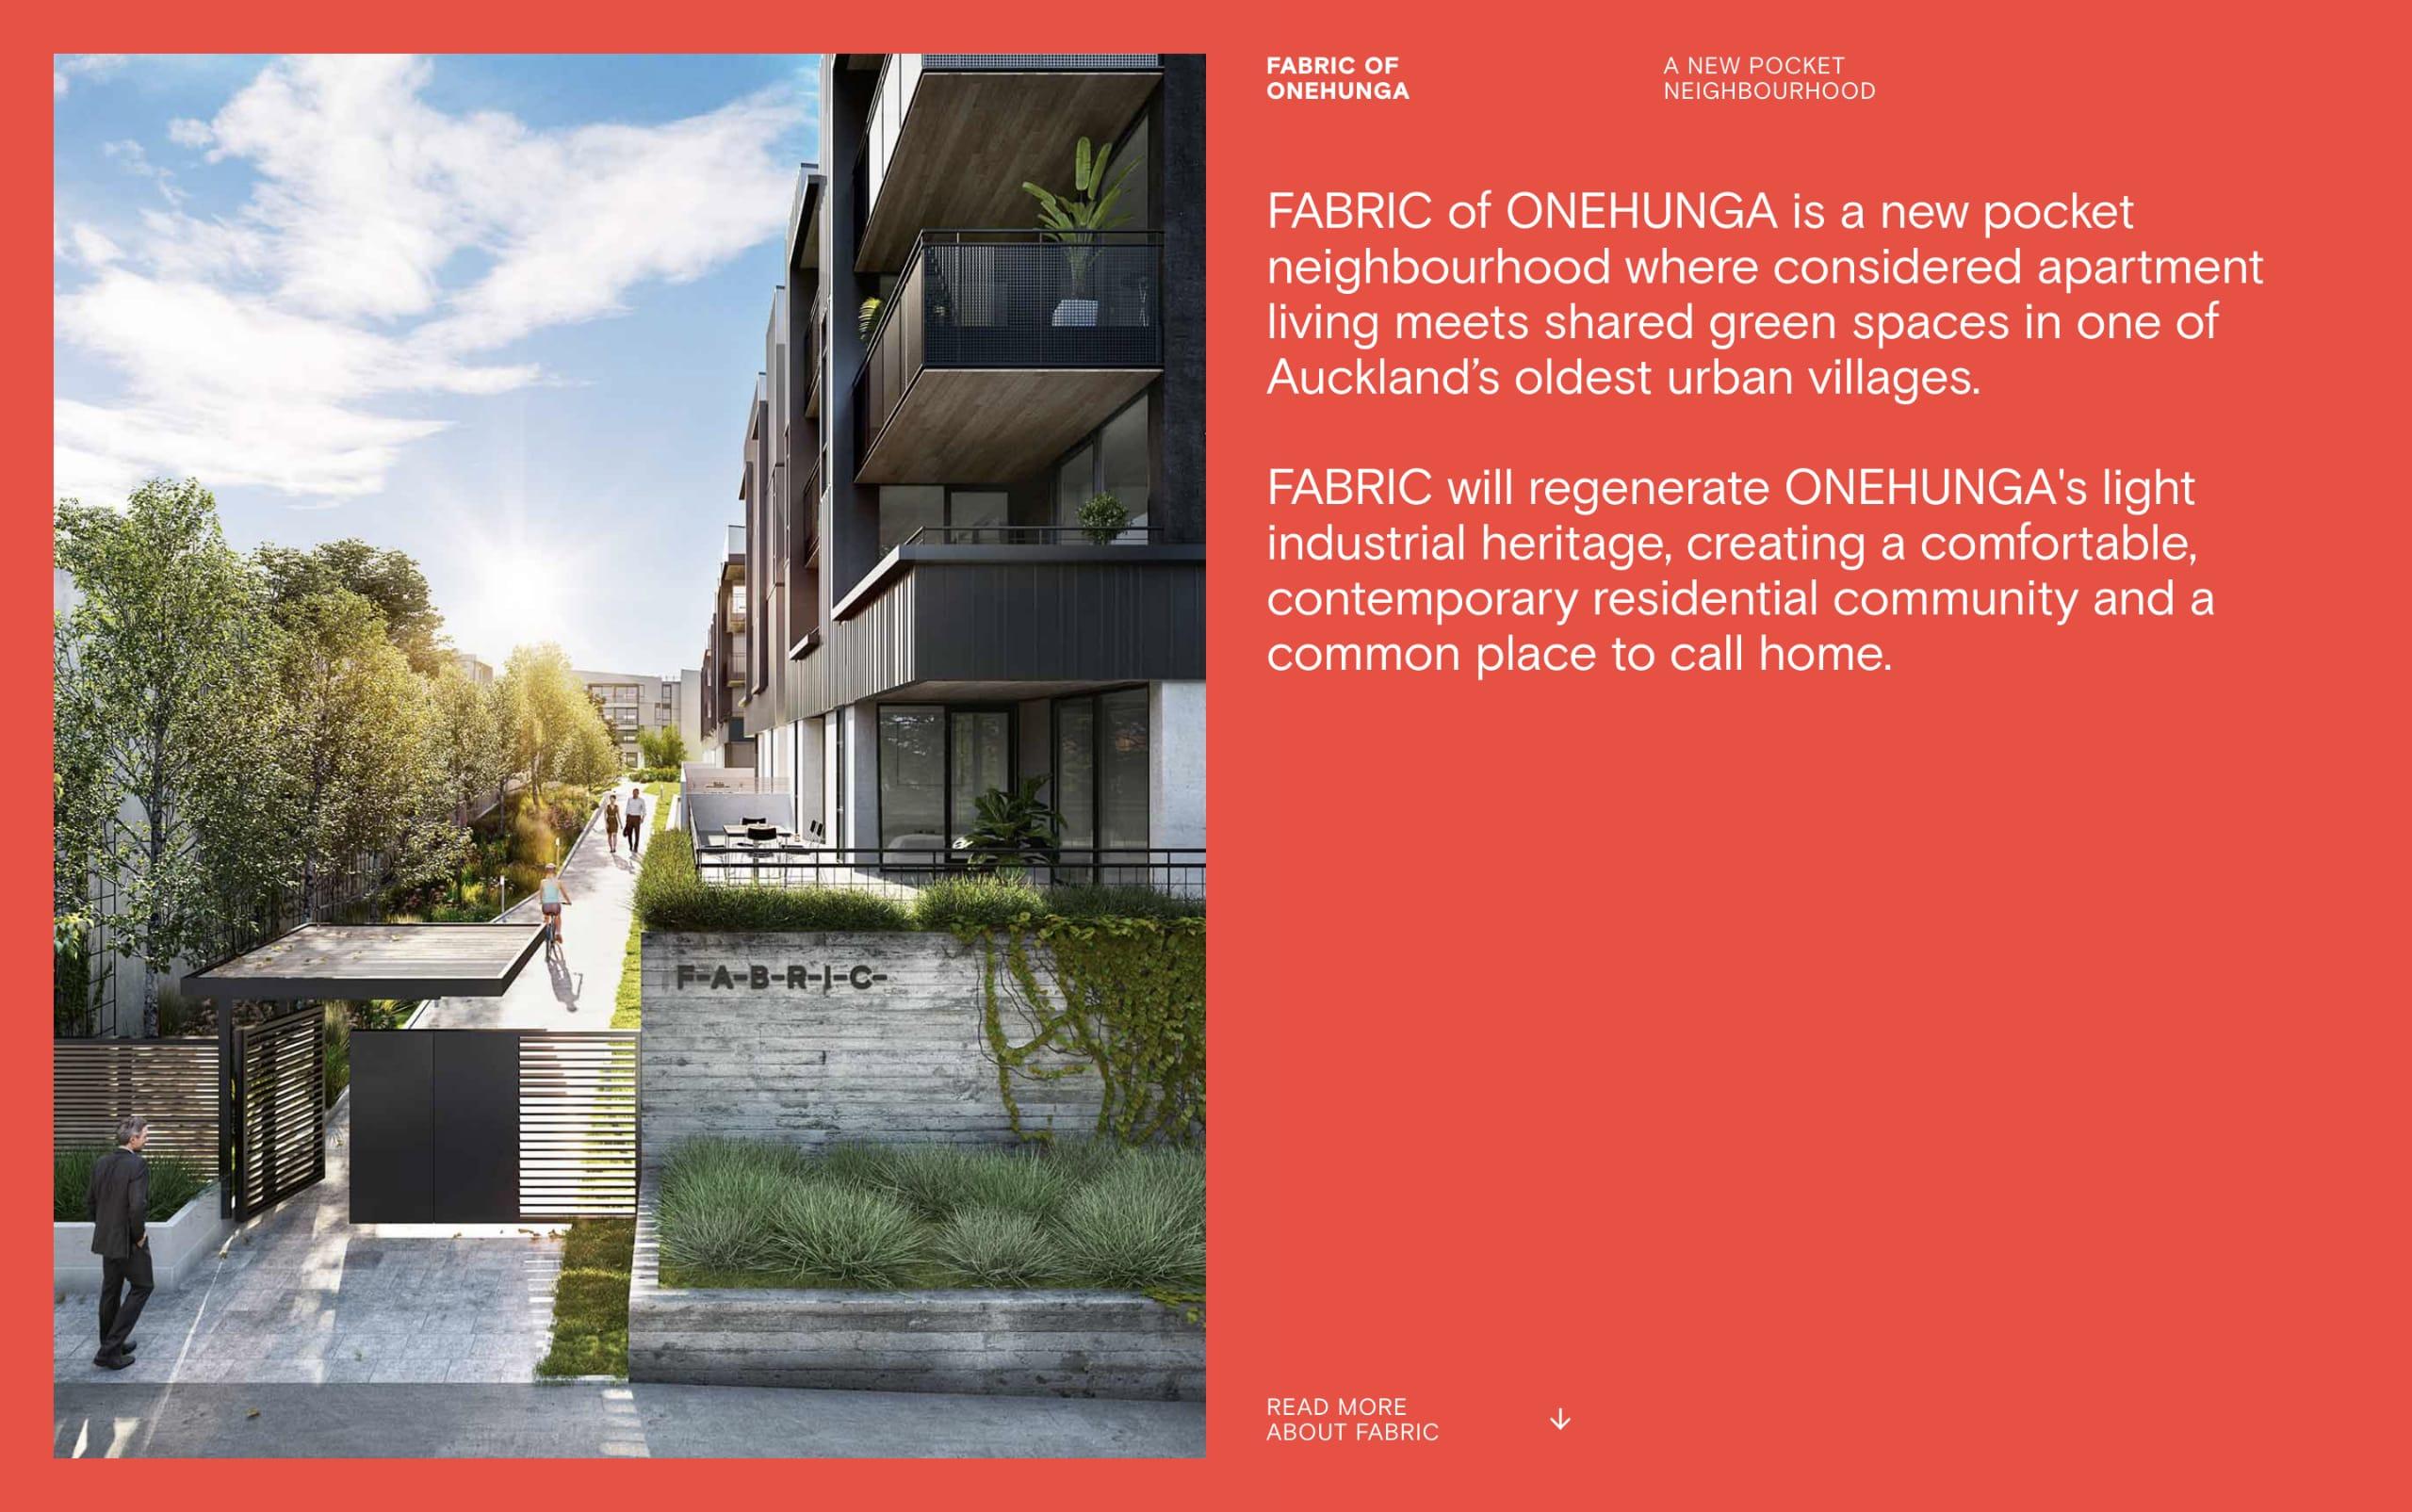 Fabric of Omehunga Website Screenshot